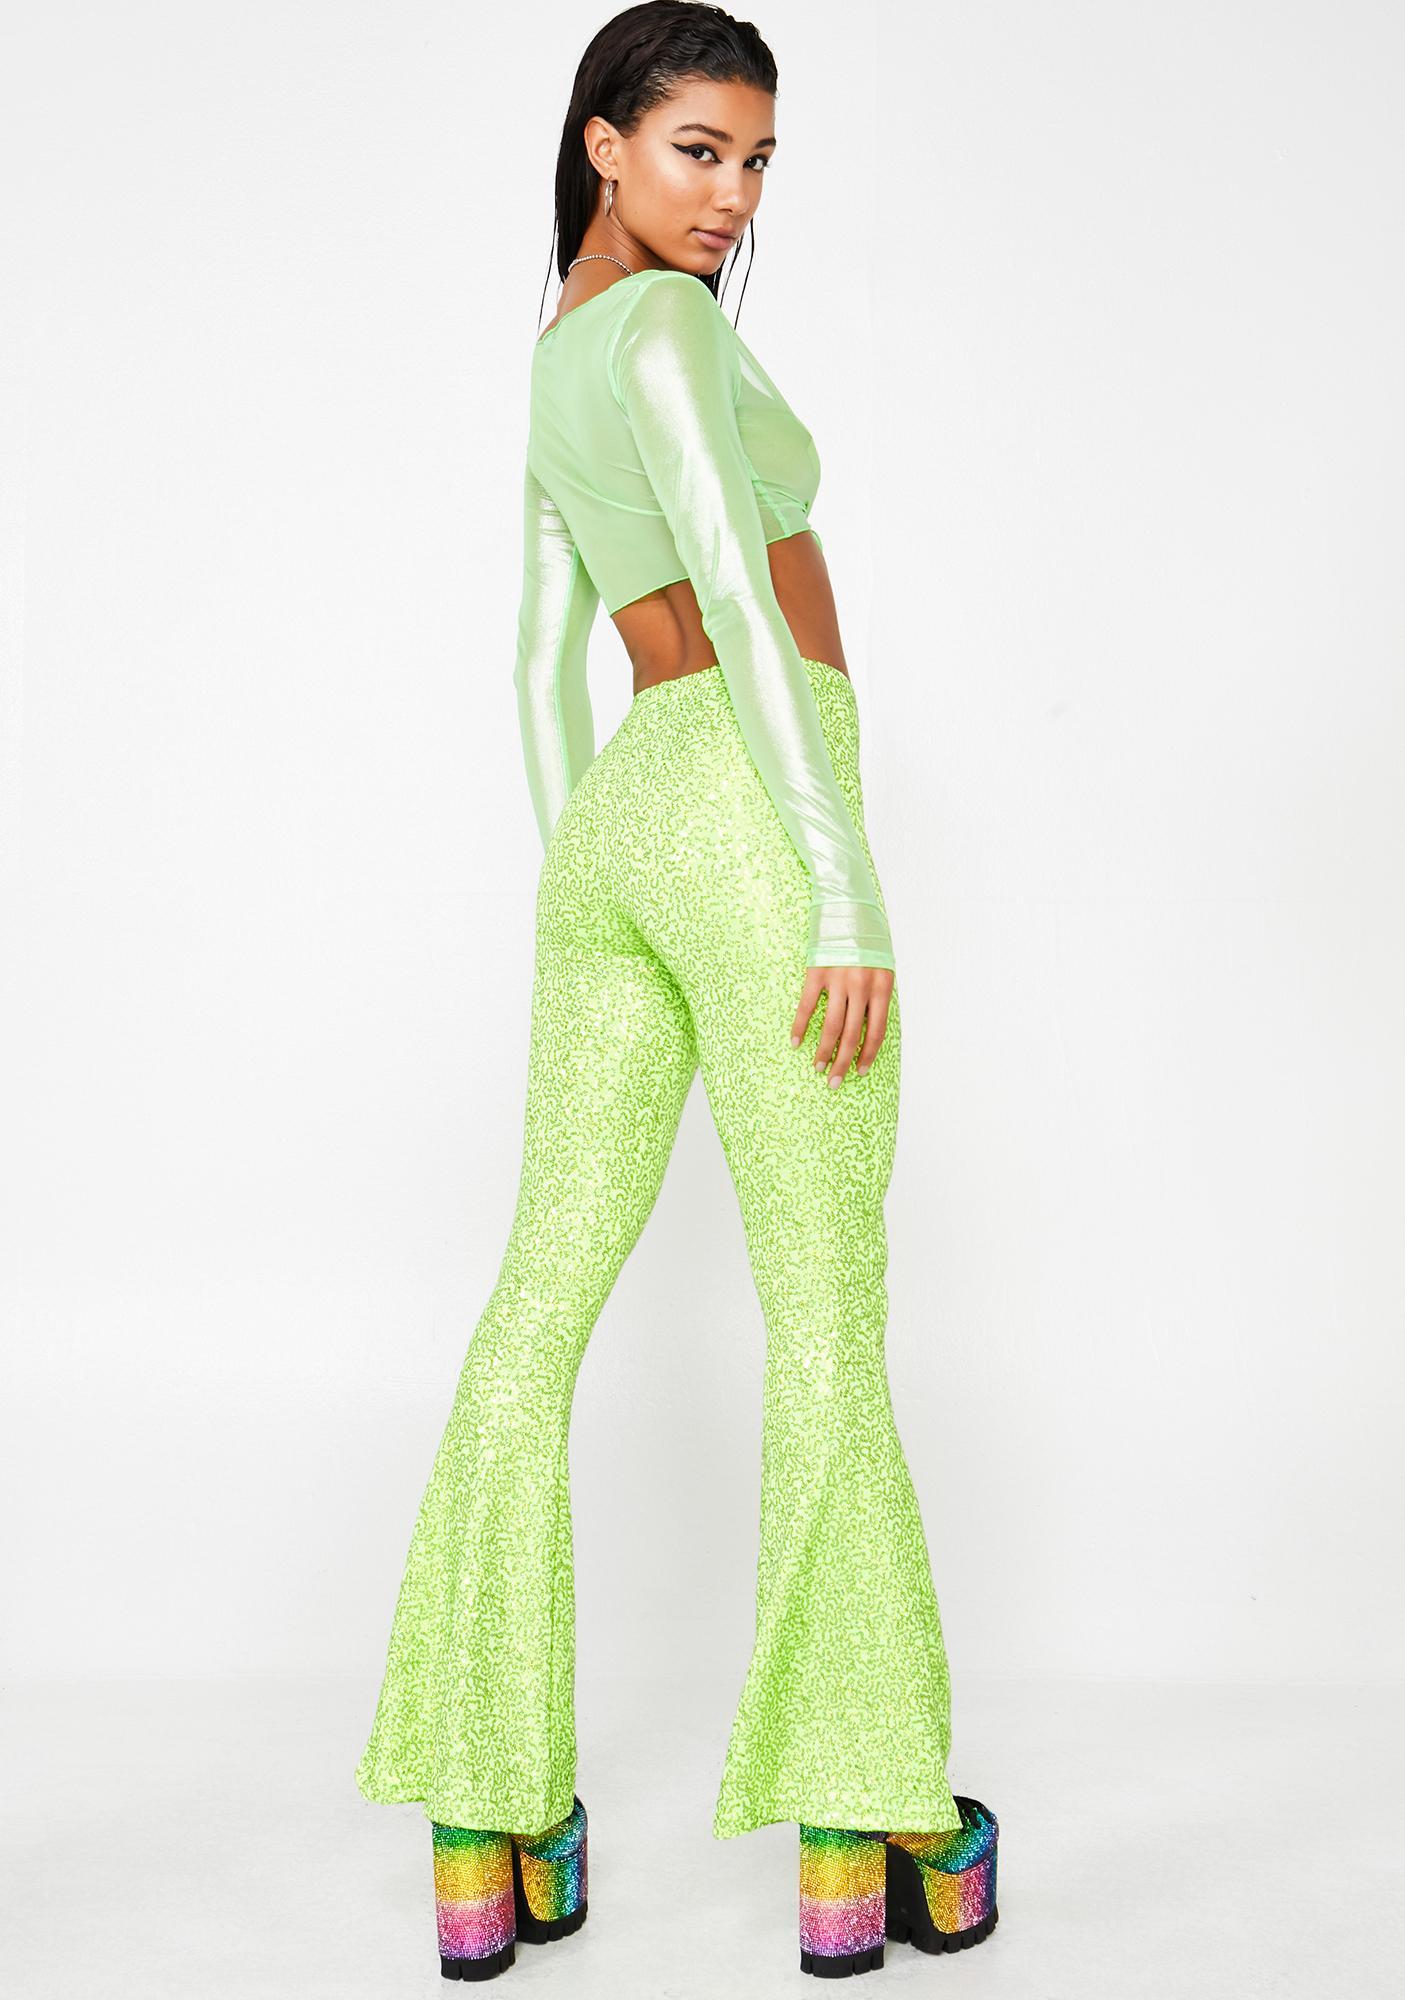 Get Crooked Sequin Lycra High Waist Flares